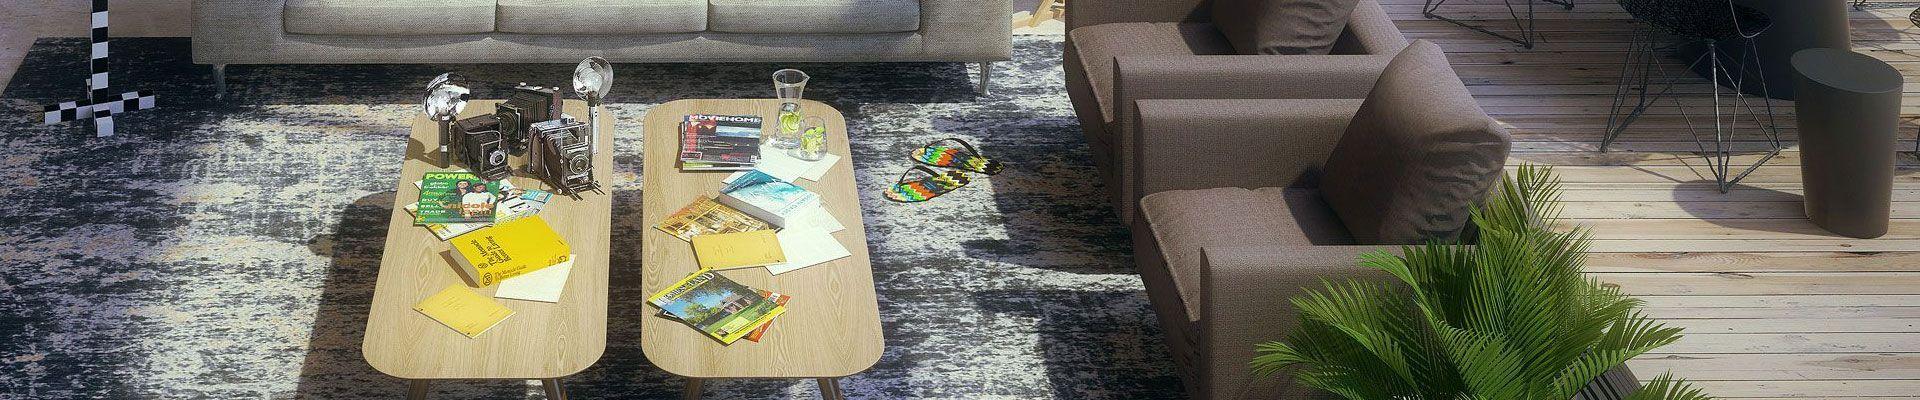 Moooi salontafels